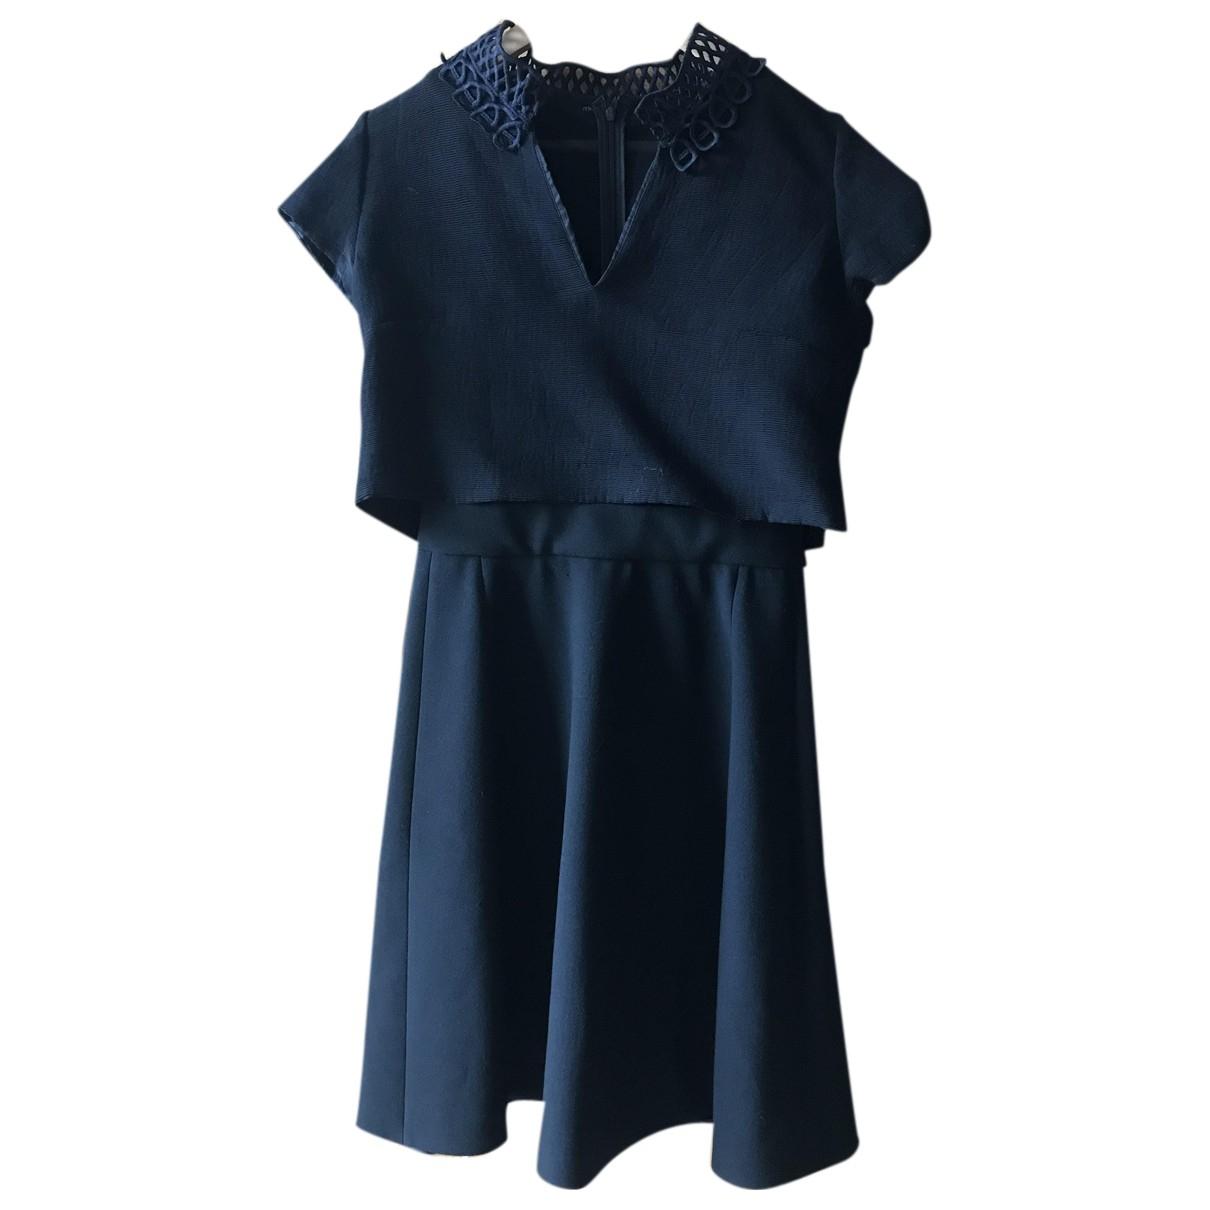 Maje N Black dress for Women 3 0-5